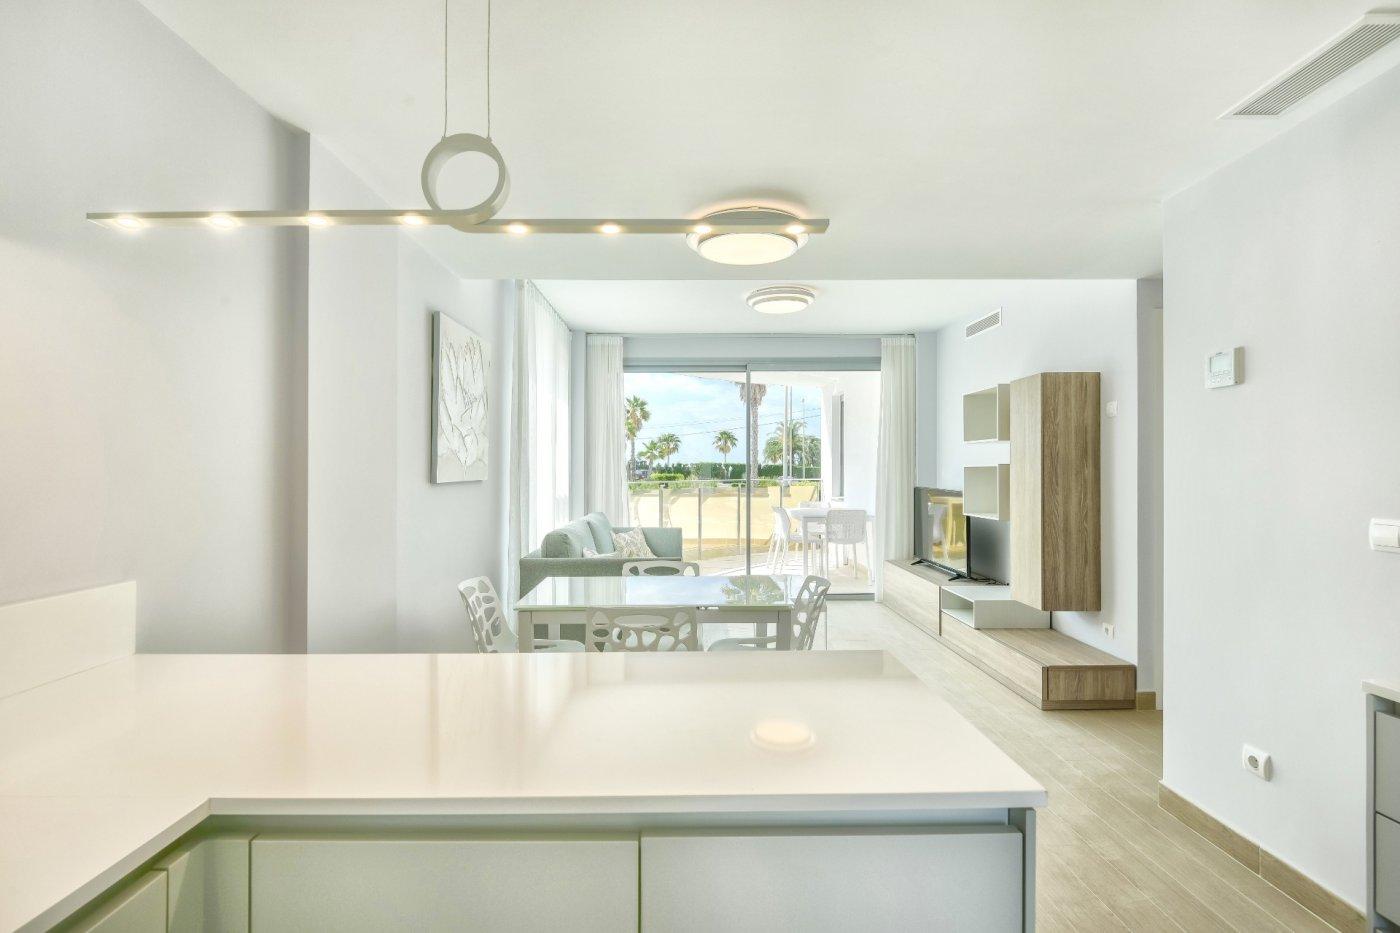 Estate Agents Moraira – Property for sale in Moraira – Apartment – Las Salinas – Calpe